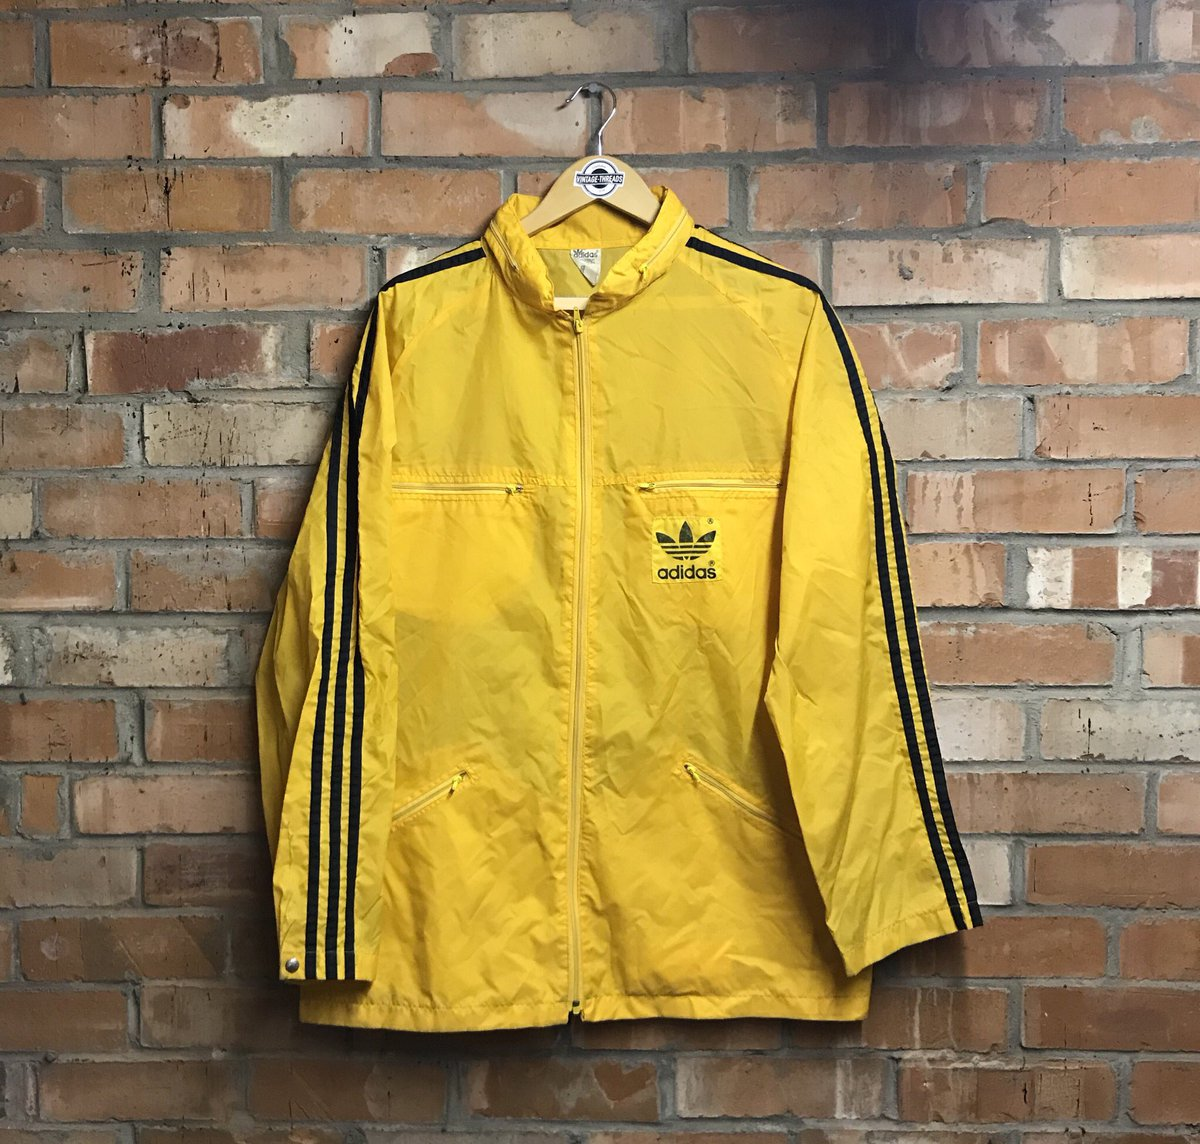 a0d560af4 On DEPOP Now! (Link in bio) #adidas #adidasoriginals #retrostyle #vintage  #raincoat #vintagethreads #vintagestyle #vintageadidas pic.twitter.com/C0E2dIDxYC